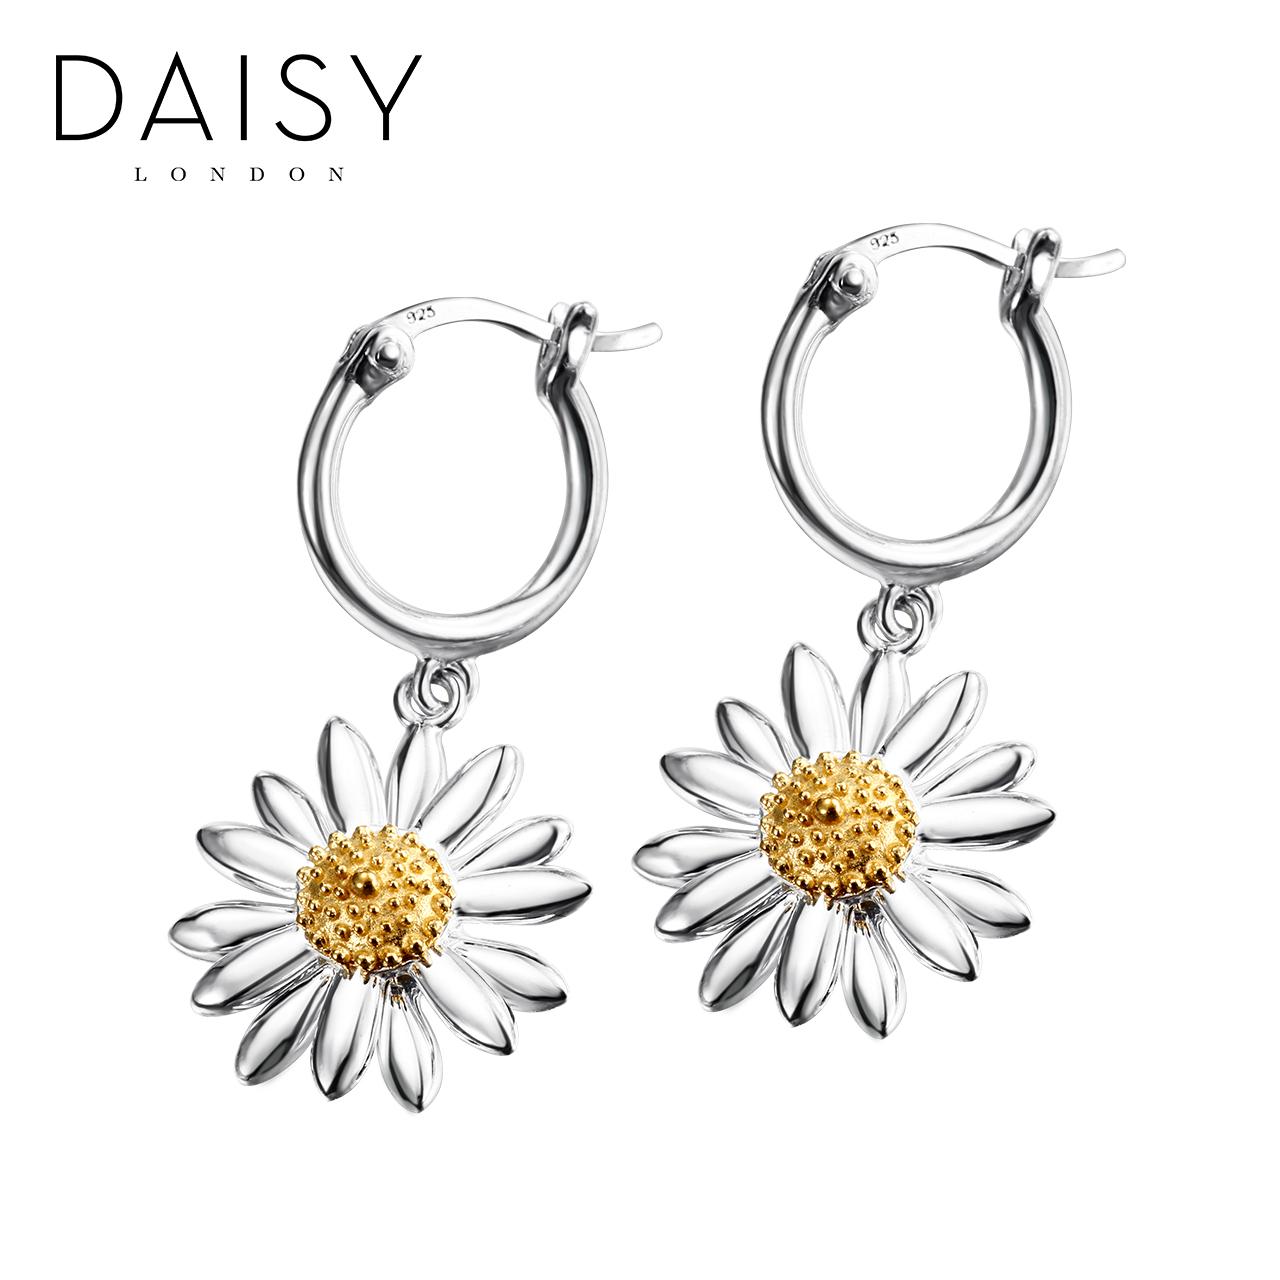 daisy london手工复古雏菊耳环女 长款925银饰品花朵ins耳钉耳坠